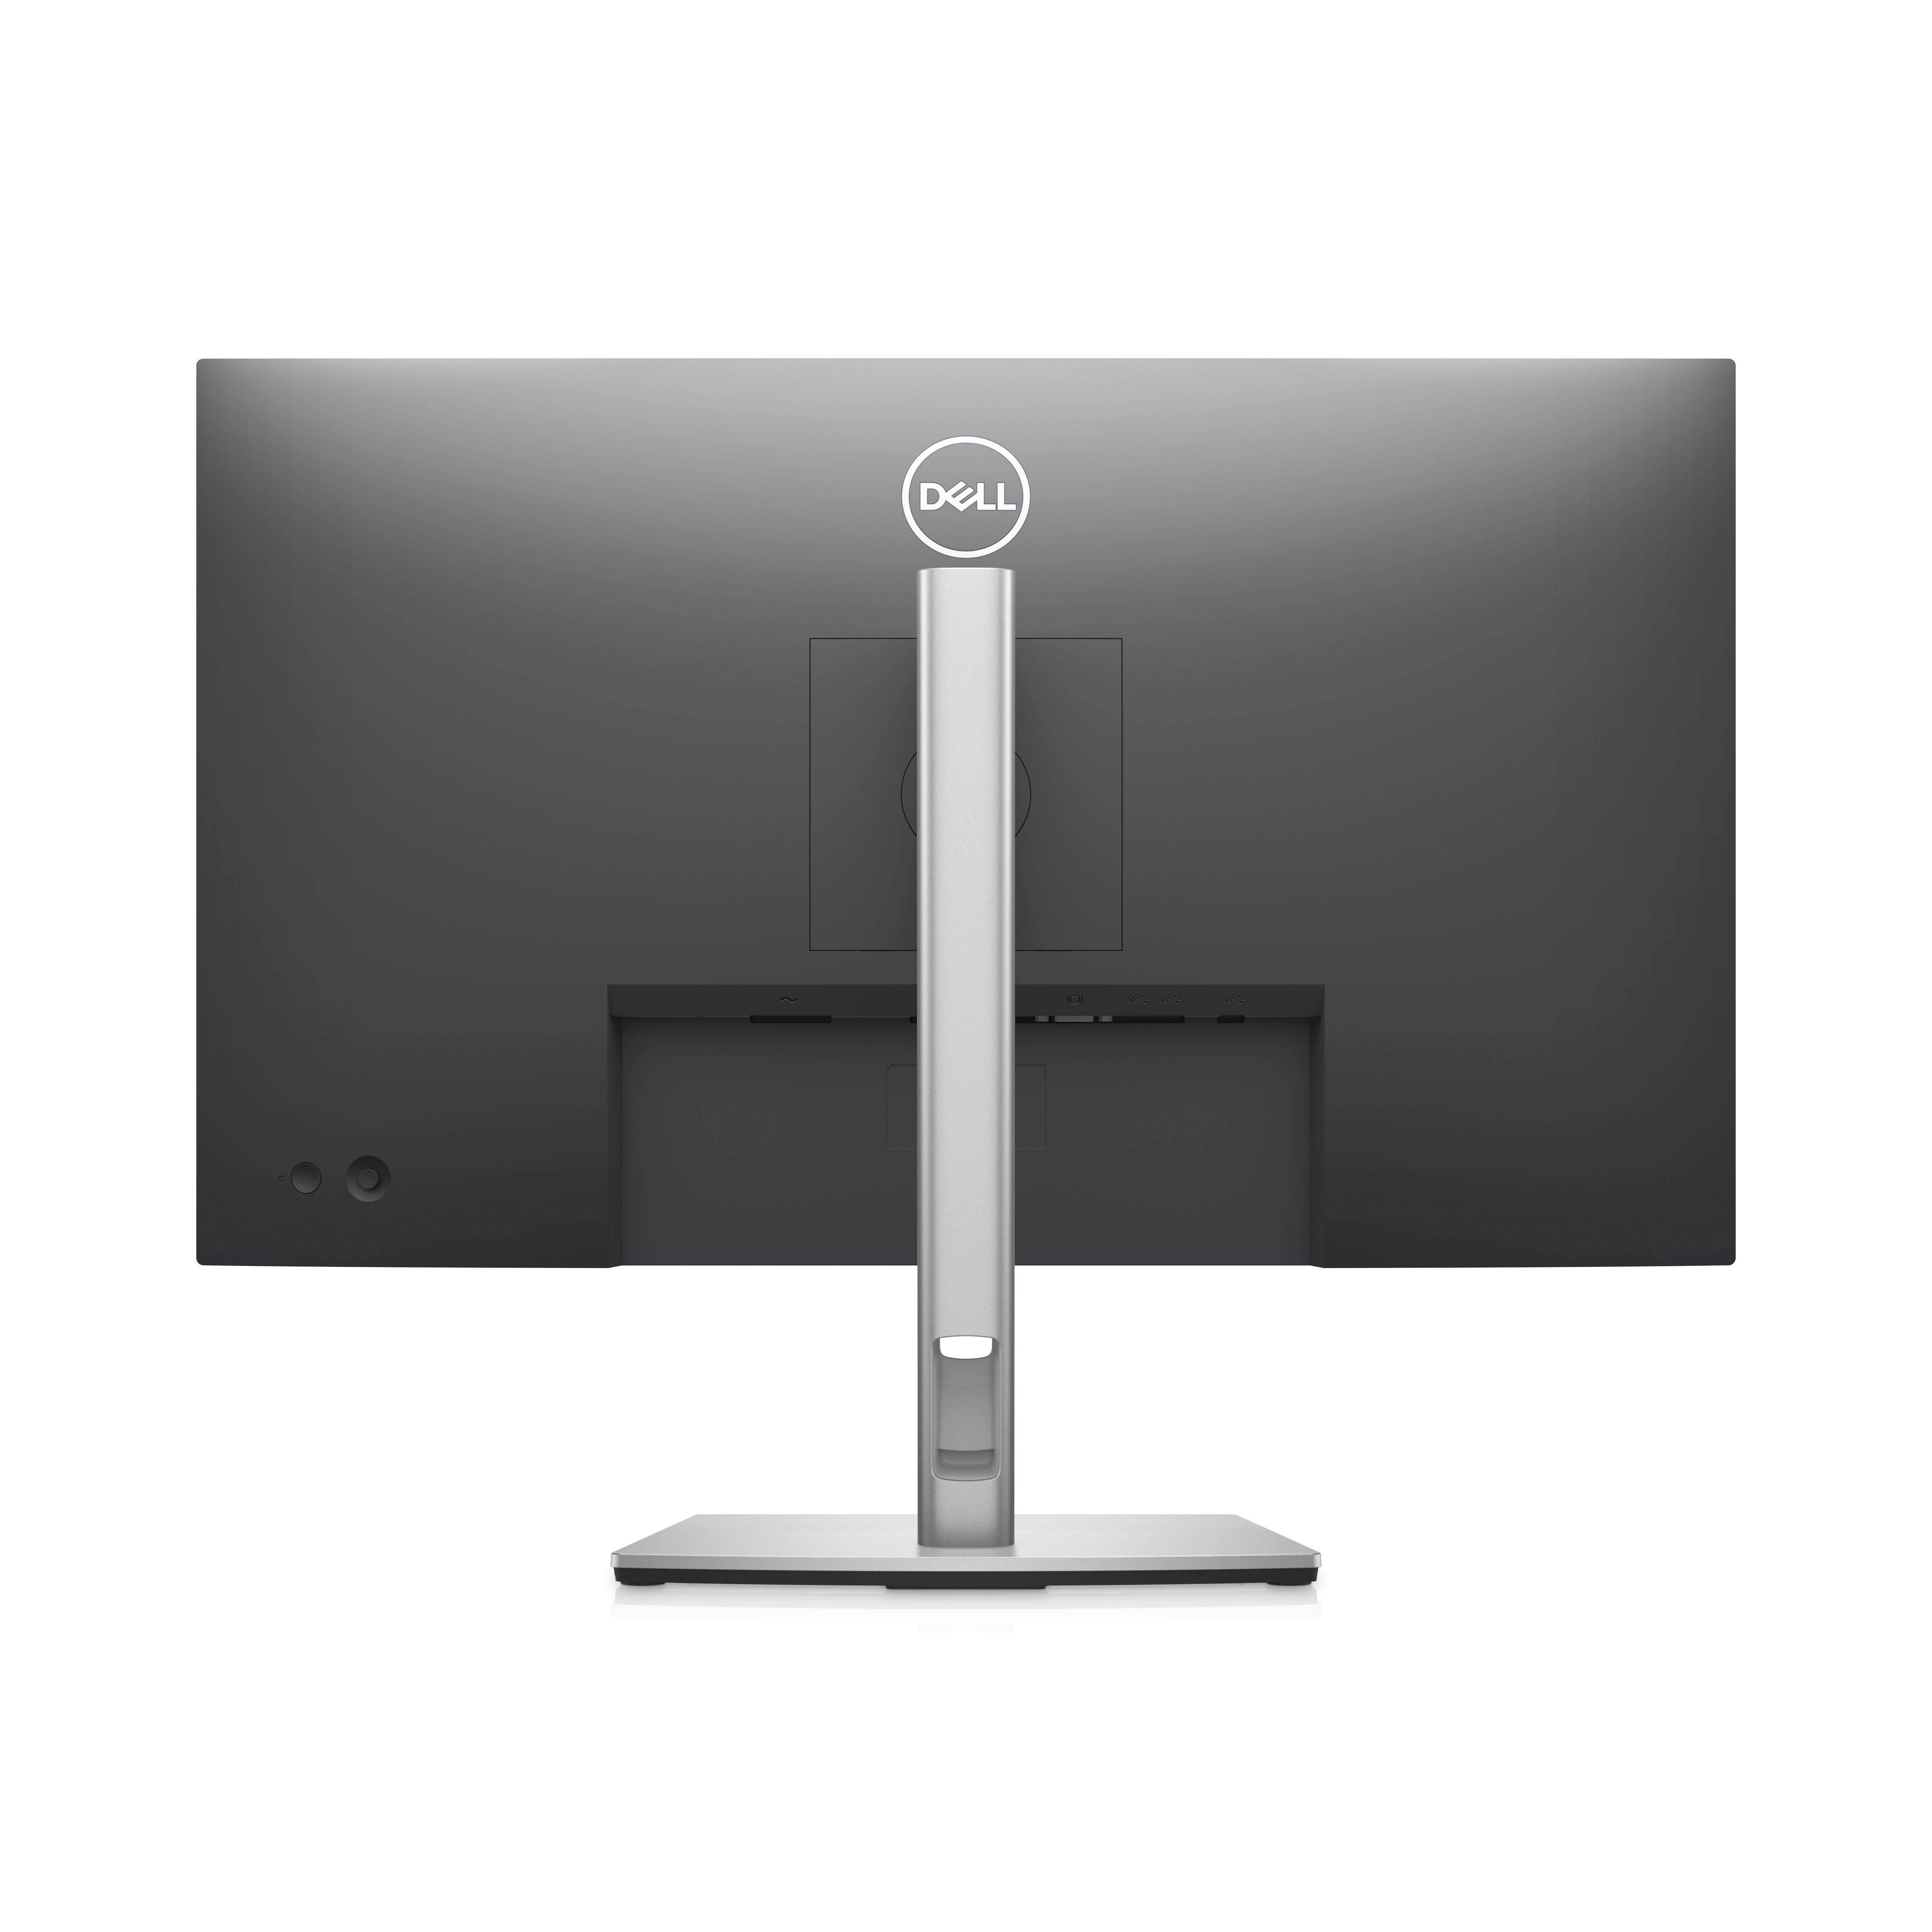 "Dell P2722HE - LED-Monitor - 68.6 cm (27"") - 1920 x 1080 Full HD (1080p)"